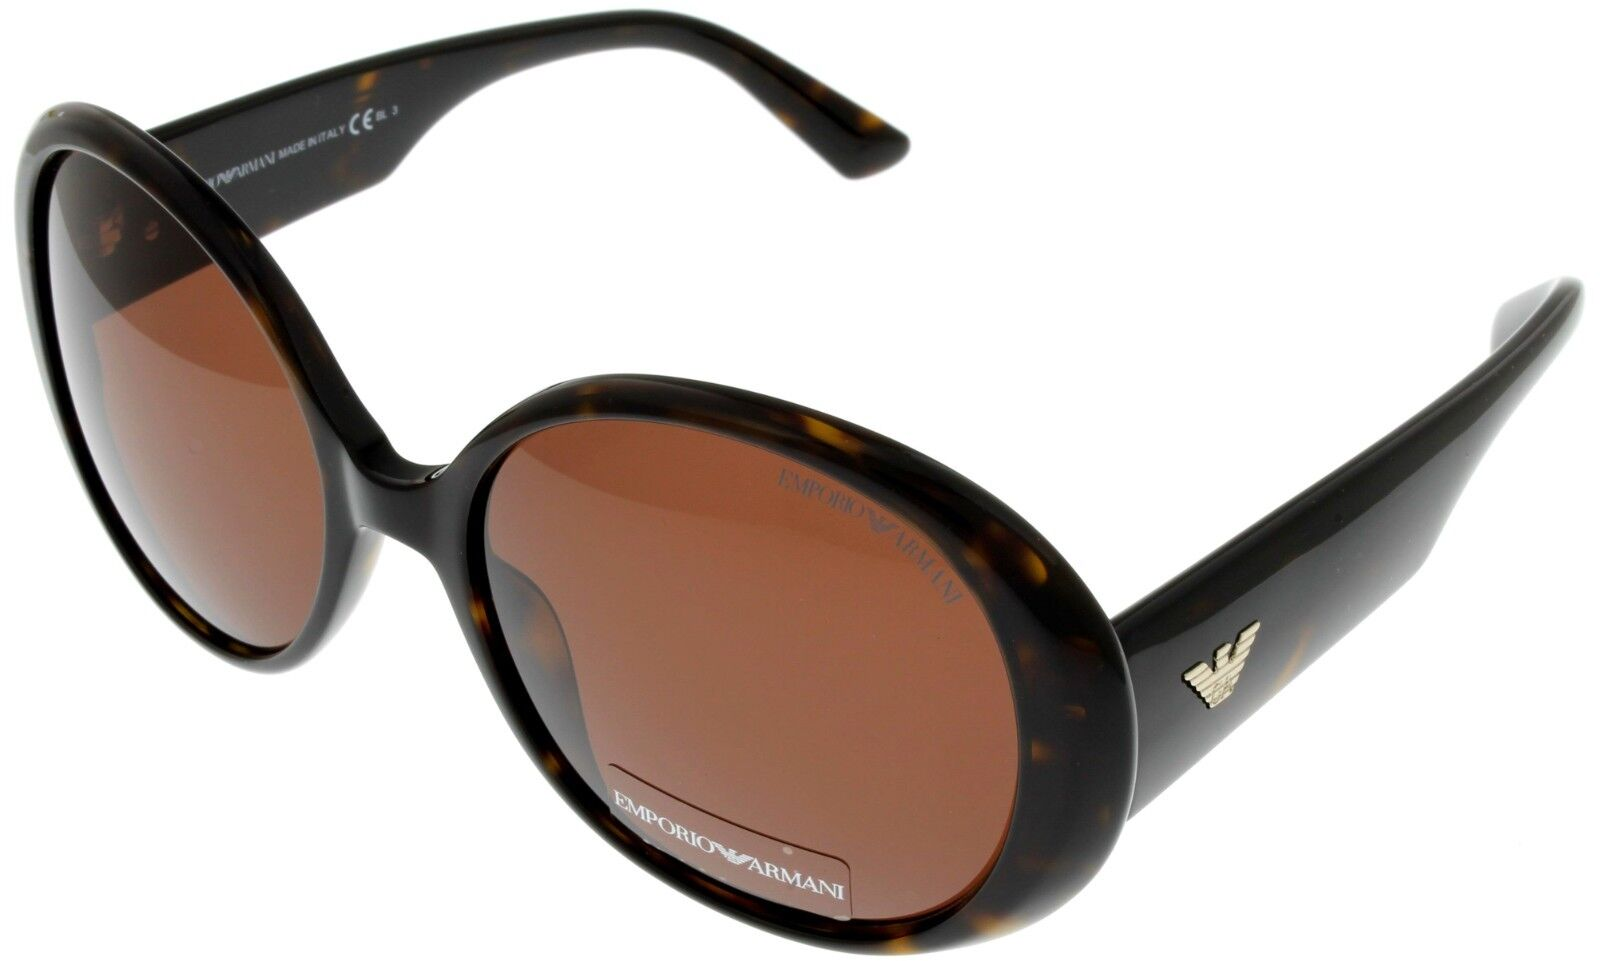 Emporio Armani Sunglasses Women Brown Dark Havana Oval EA9607/S 086